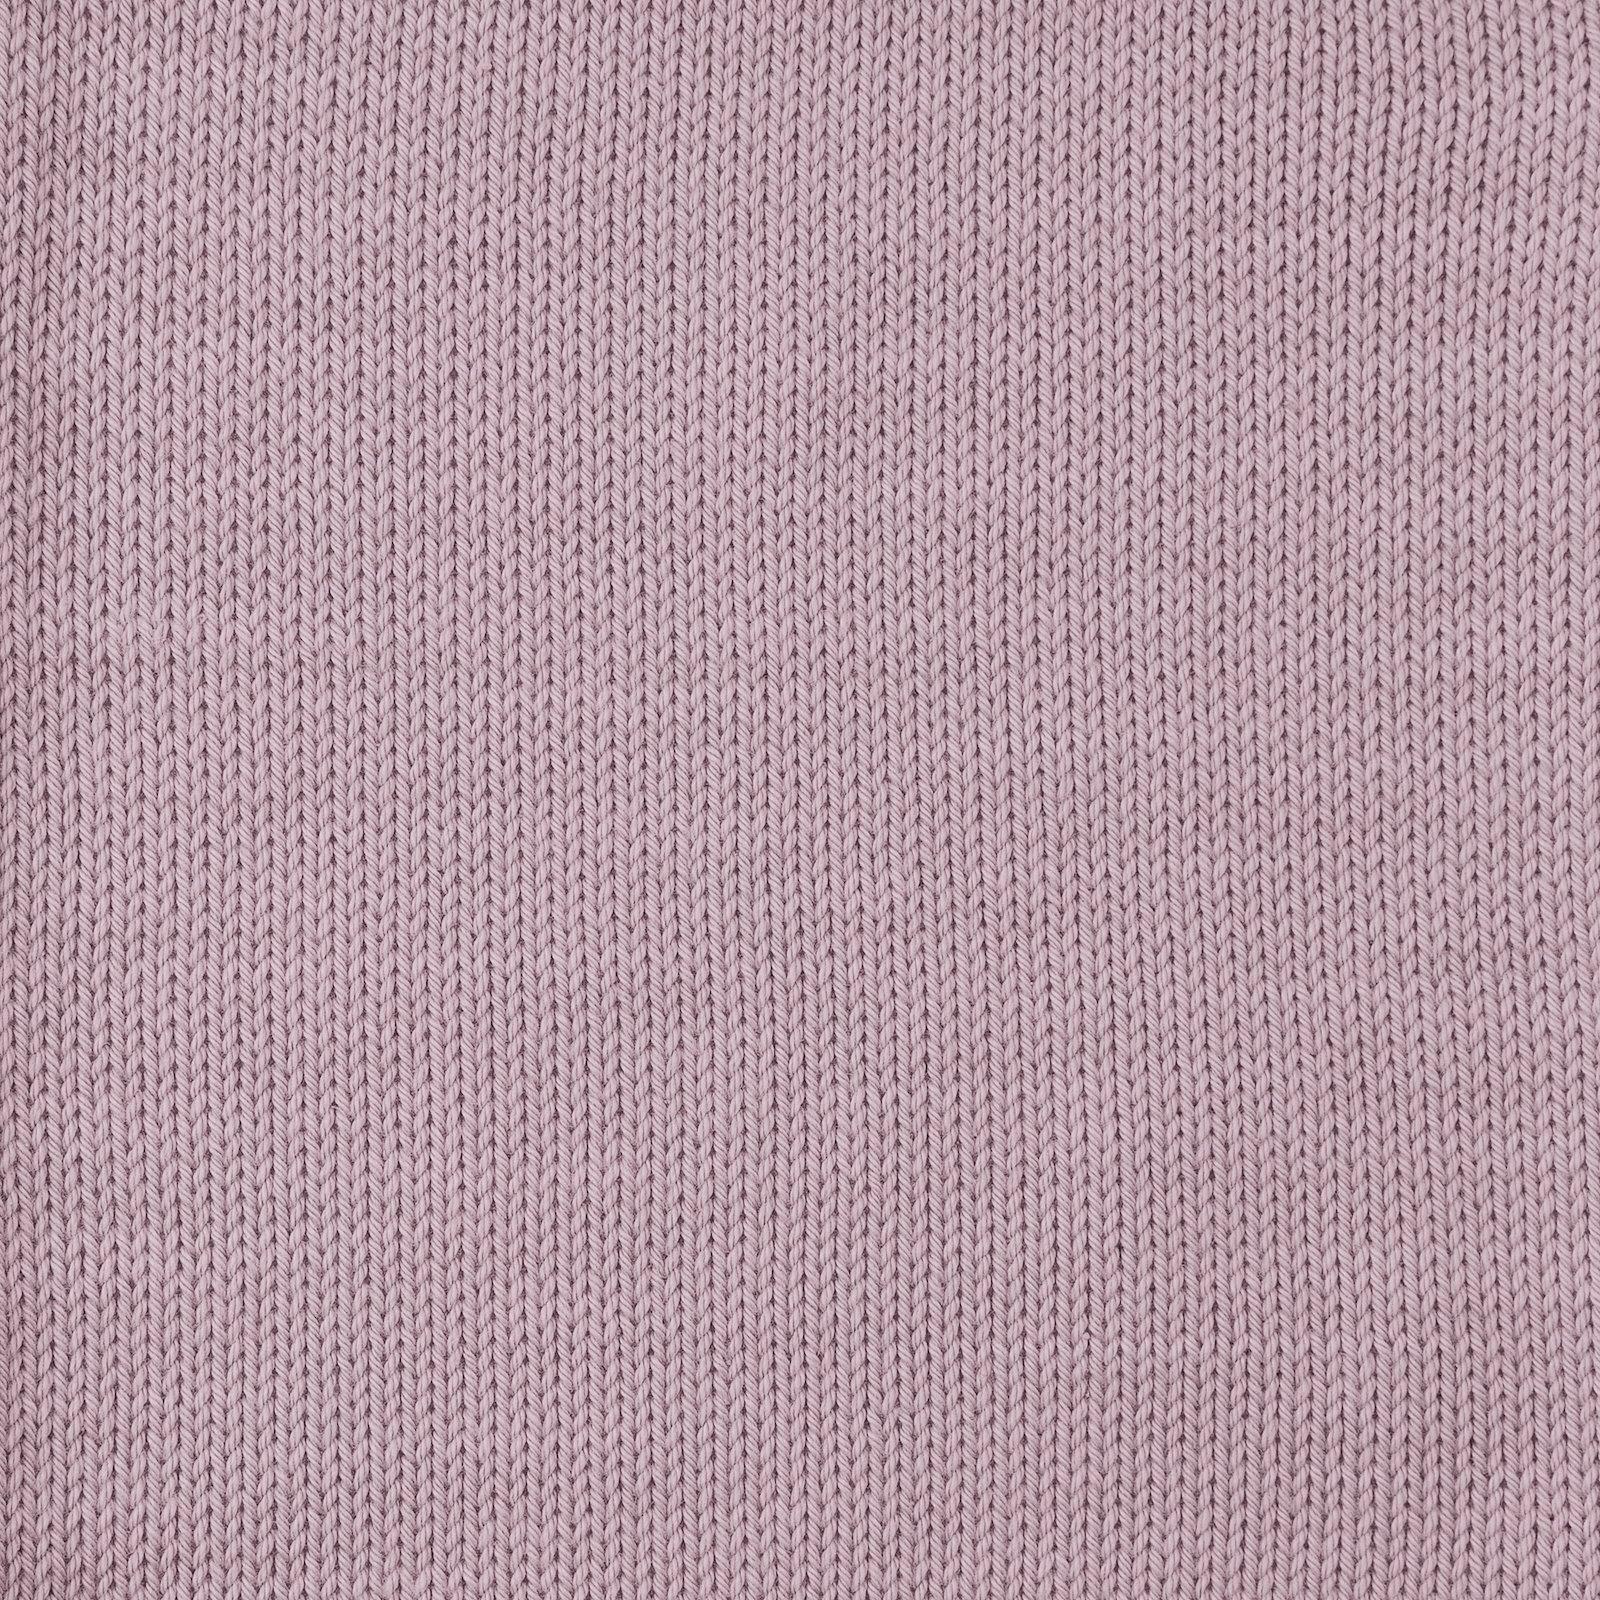 Colourful light purple 50g 90060078_sskit